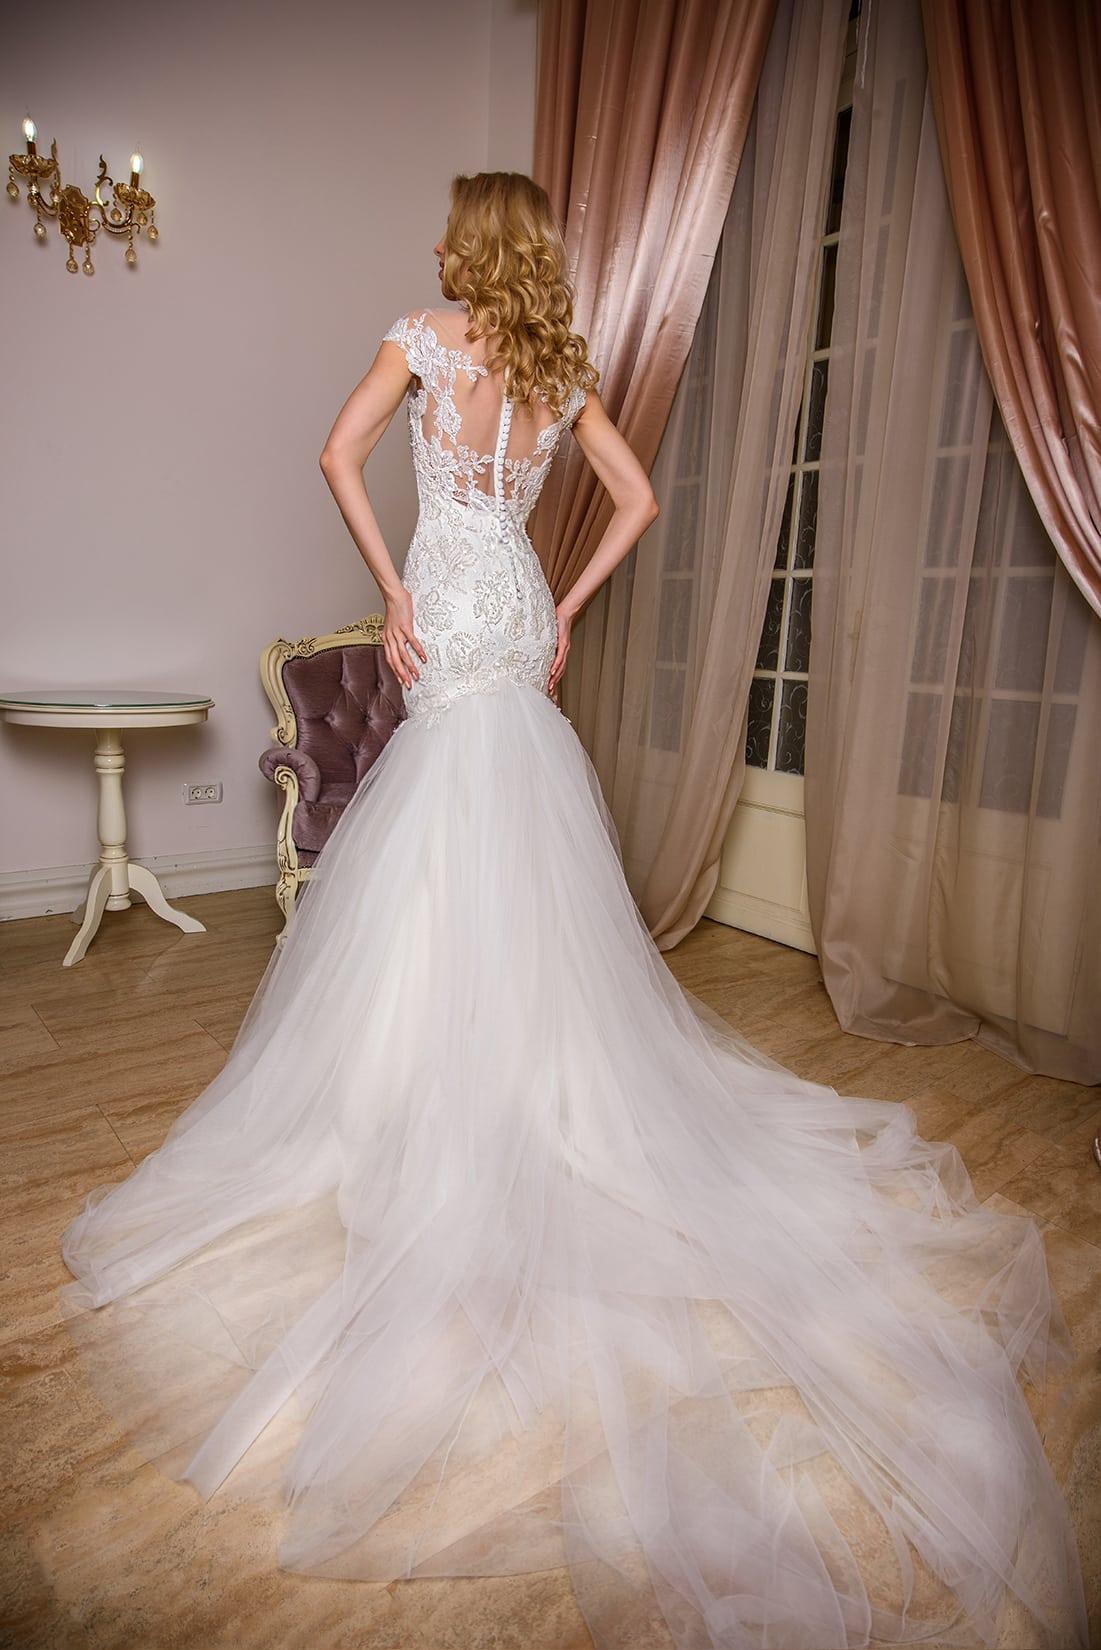 Nigella Model - Colectia Baroque - Adora Sposa (3)